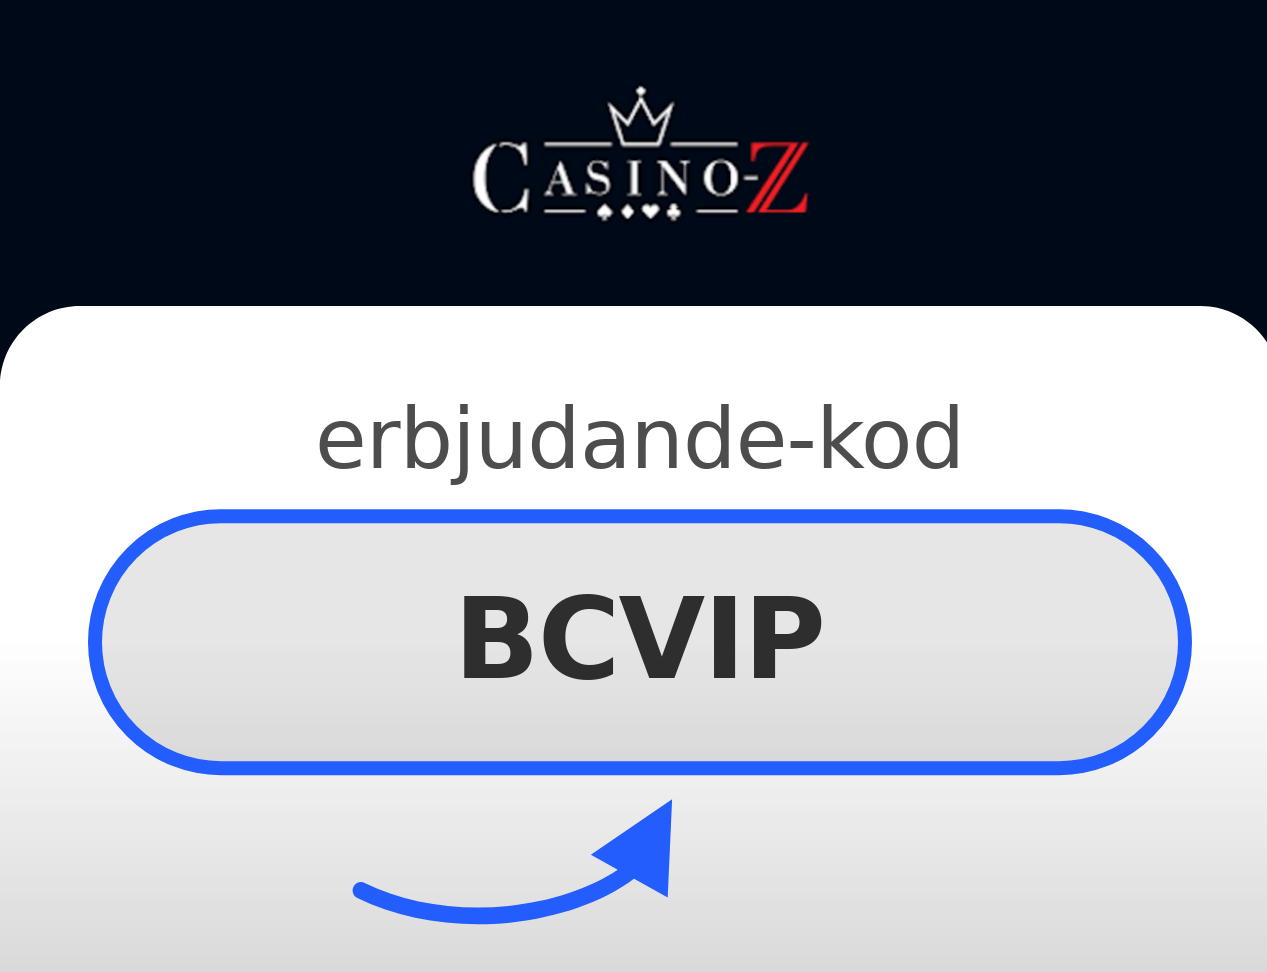 Casino Z Erbjudandekod